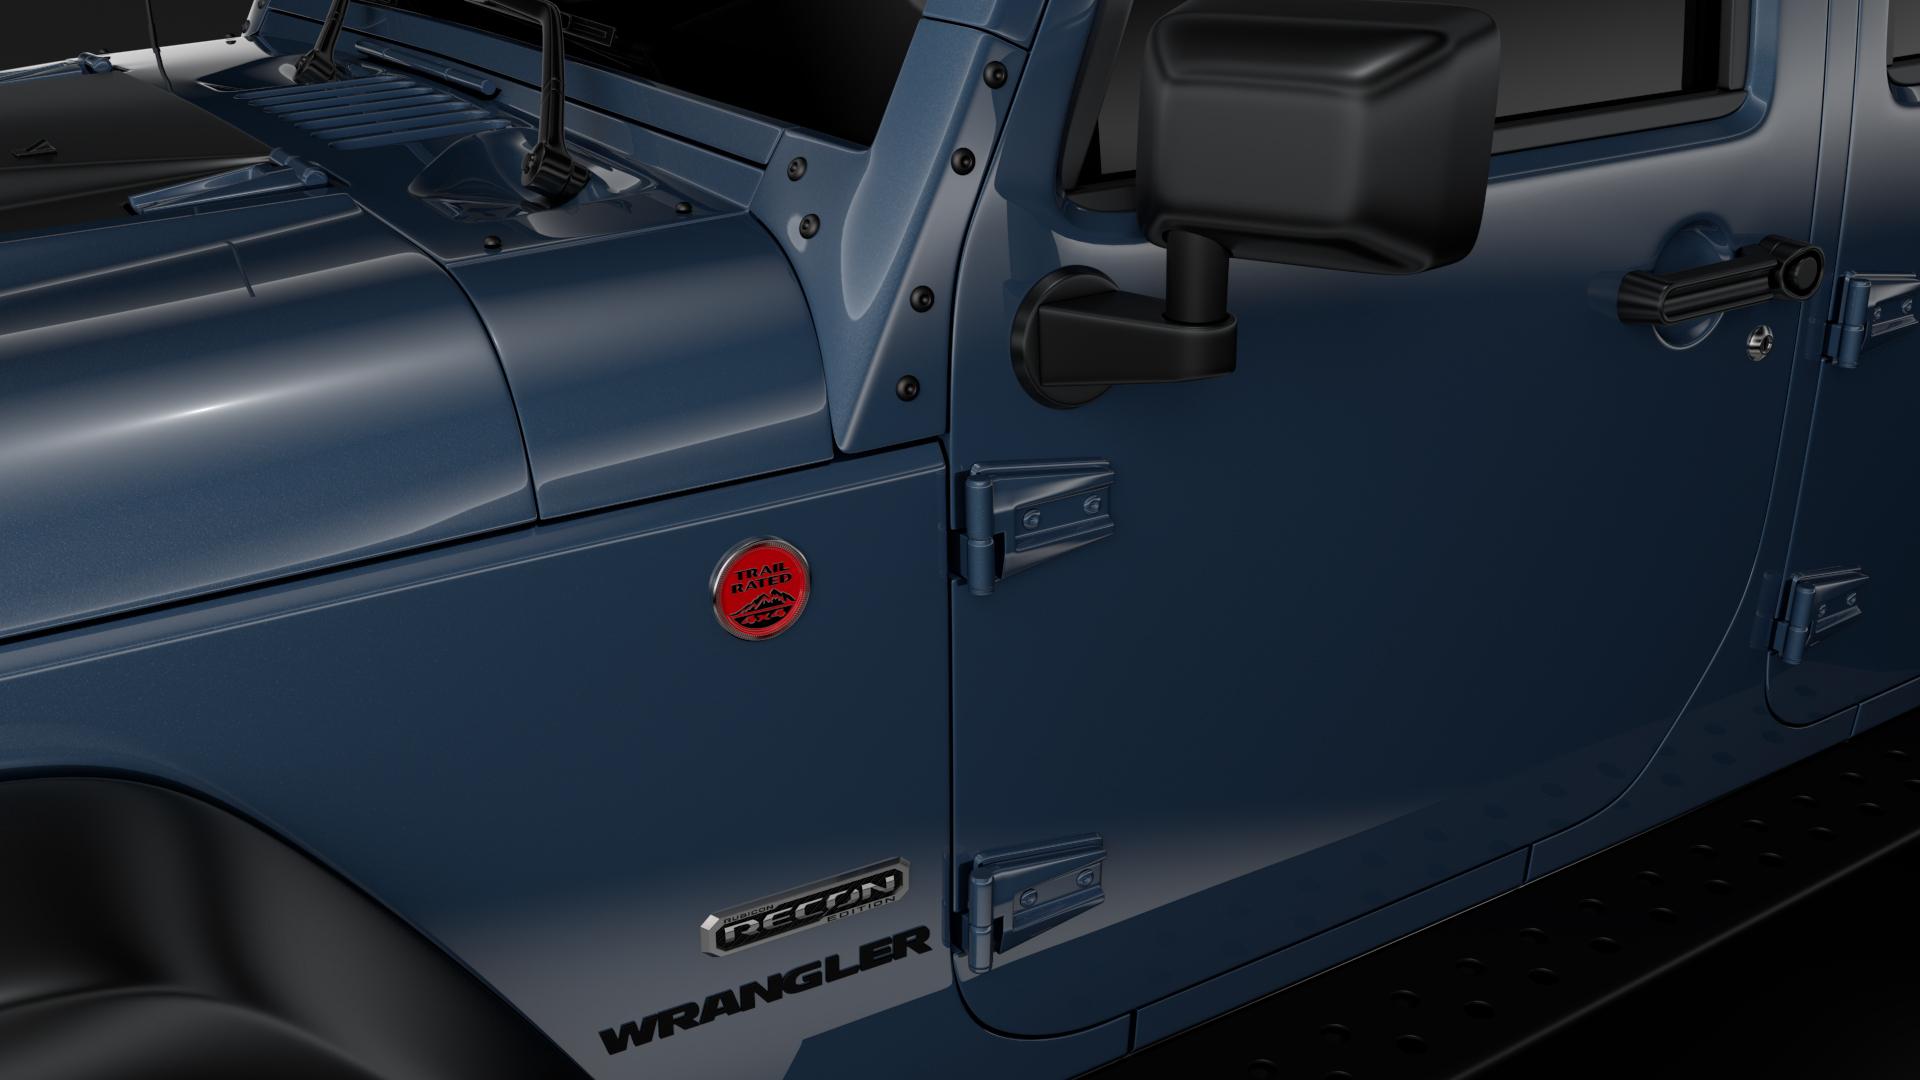 jeep wrangler unlimited rubicon recon jk 2017 3d model max fbx c4d lwo ma mb hrc xsi obj 277006